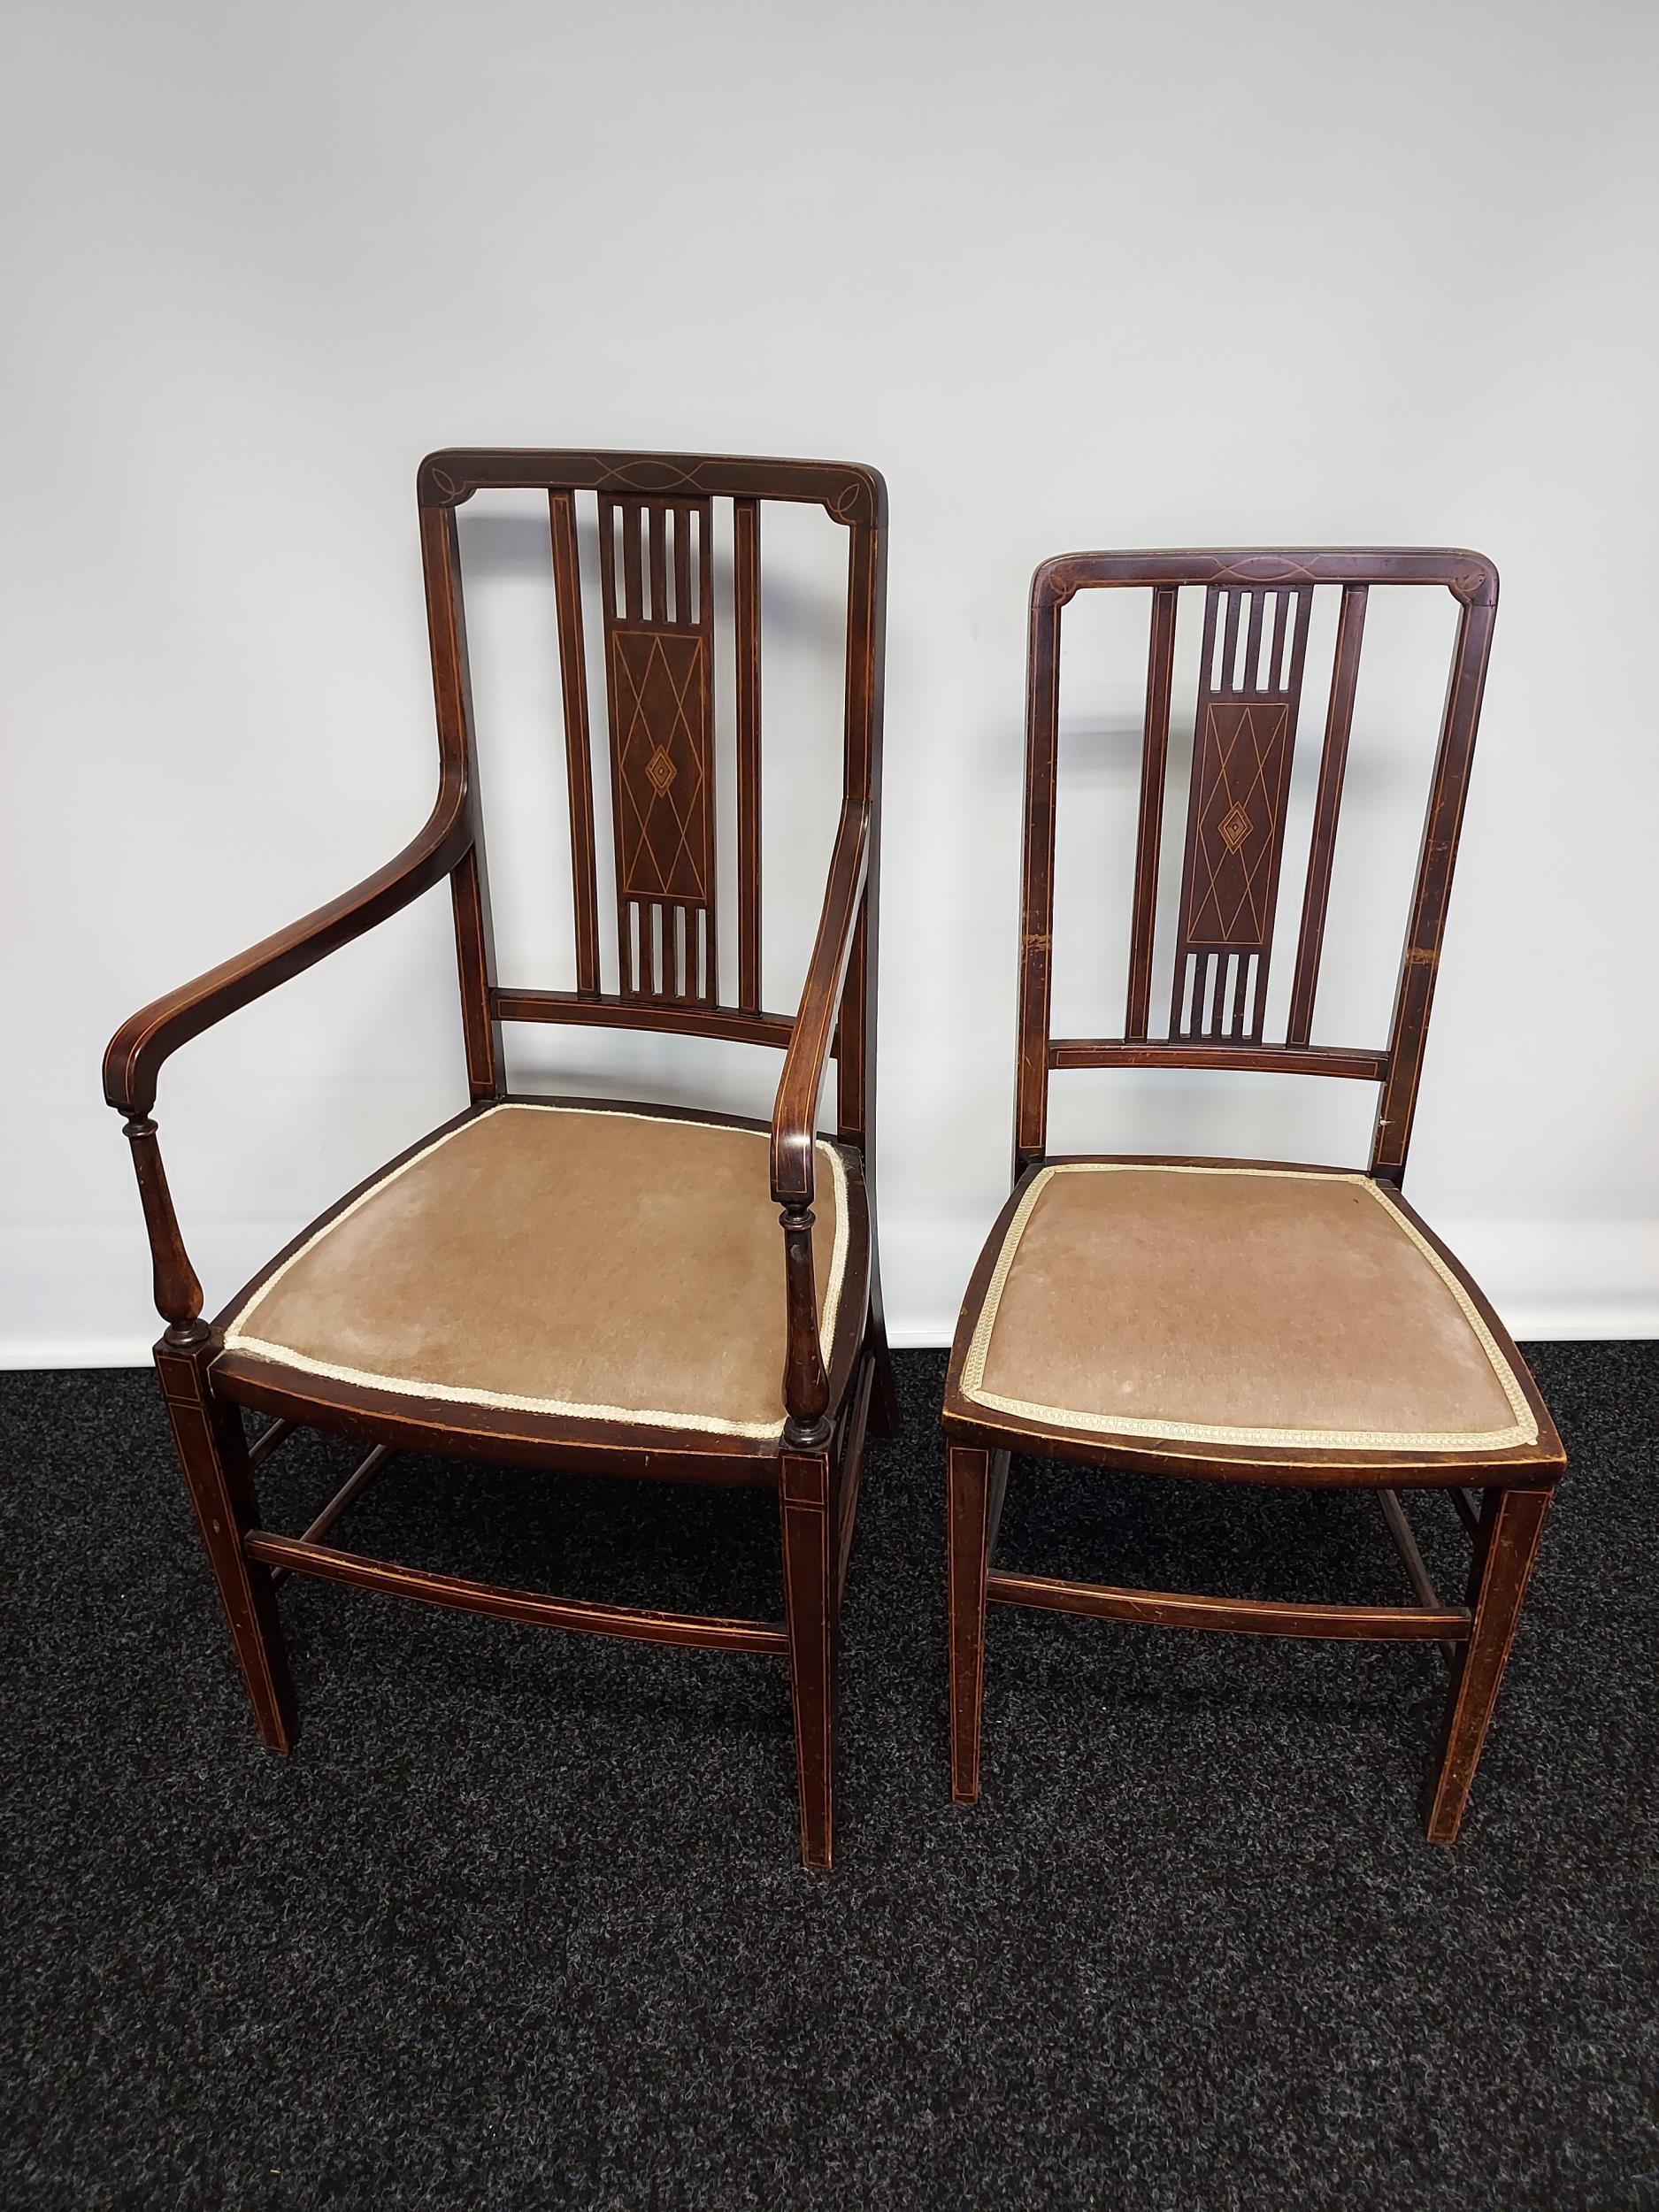 Edwardian inlaid armchair with partner chair